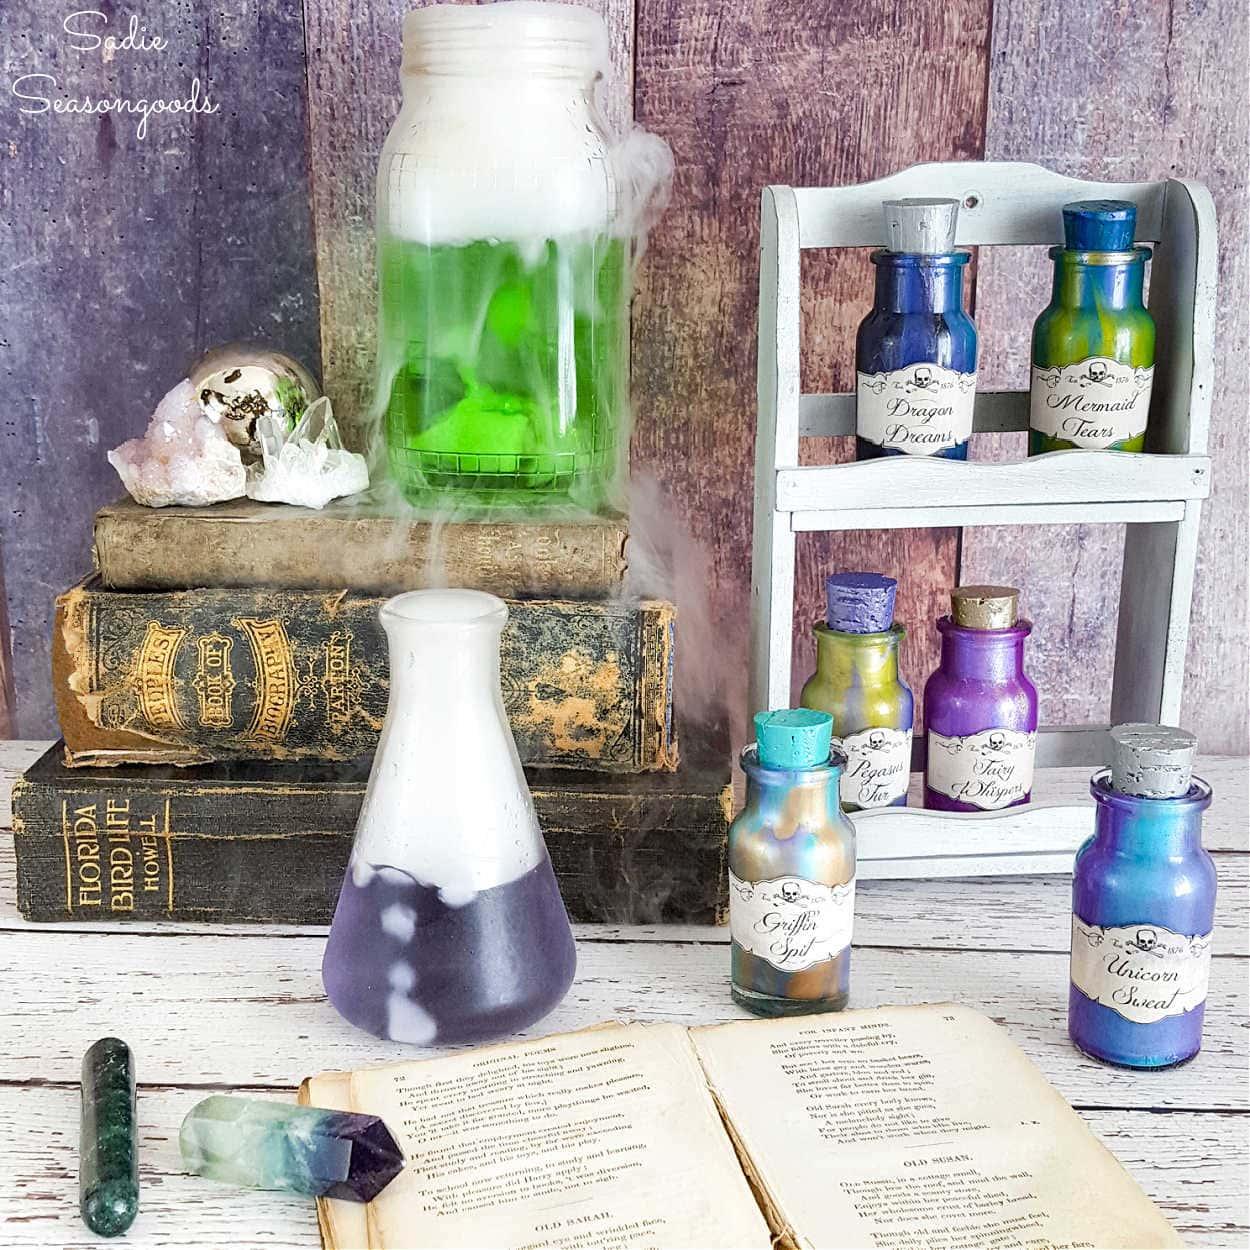 Magic Potion Bottles for Halloween